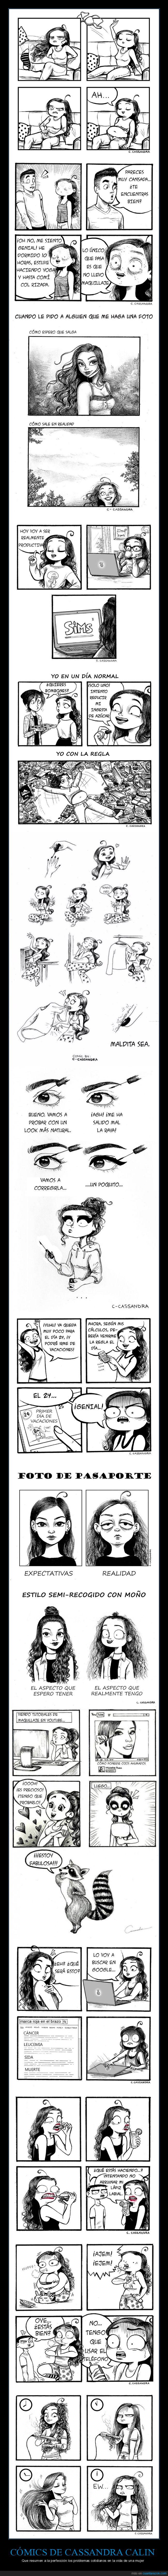 cassandra calin,cómics,mujeres,problemas